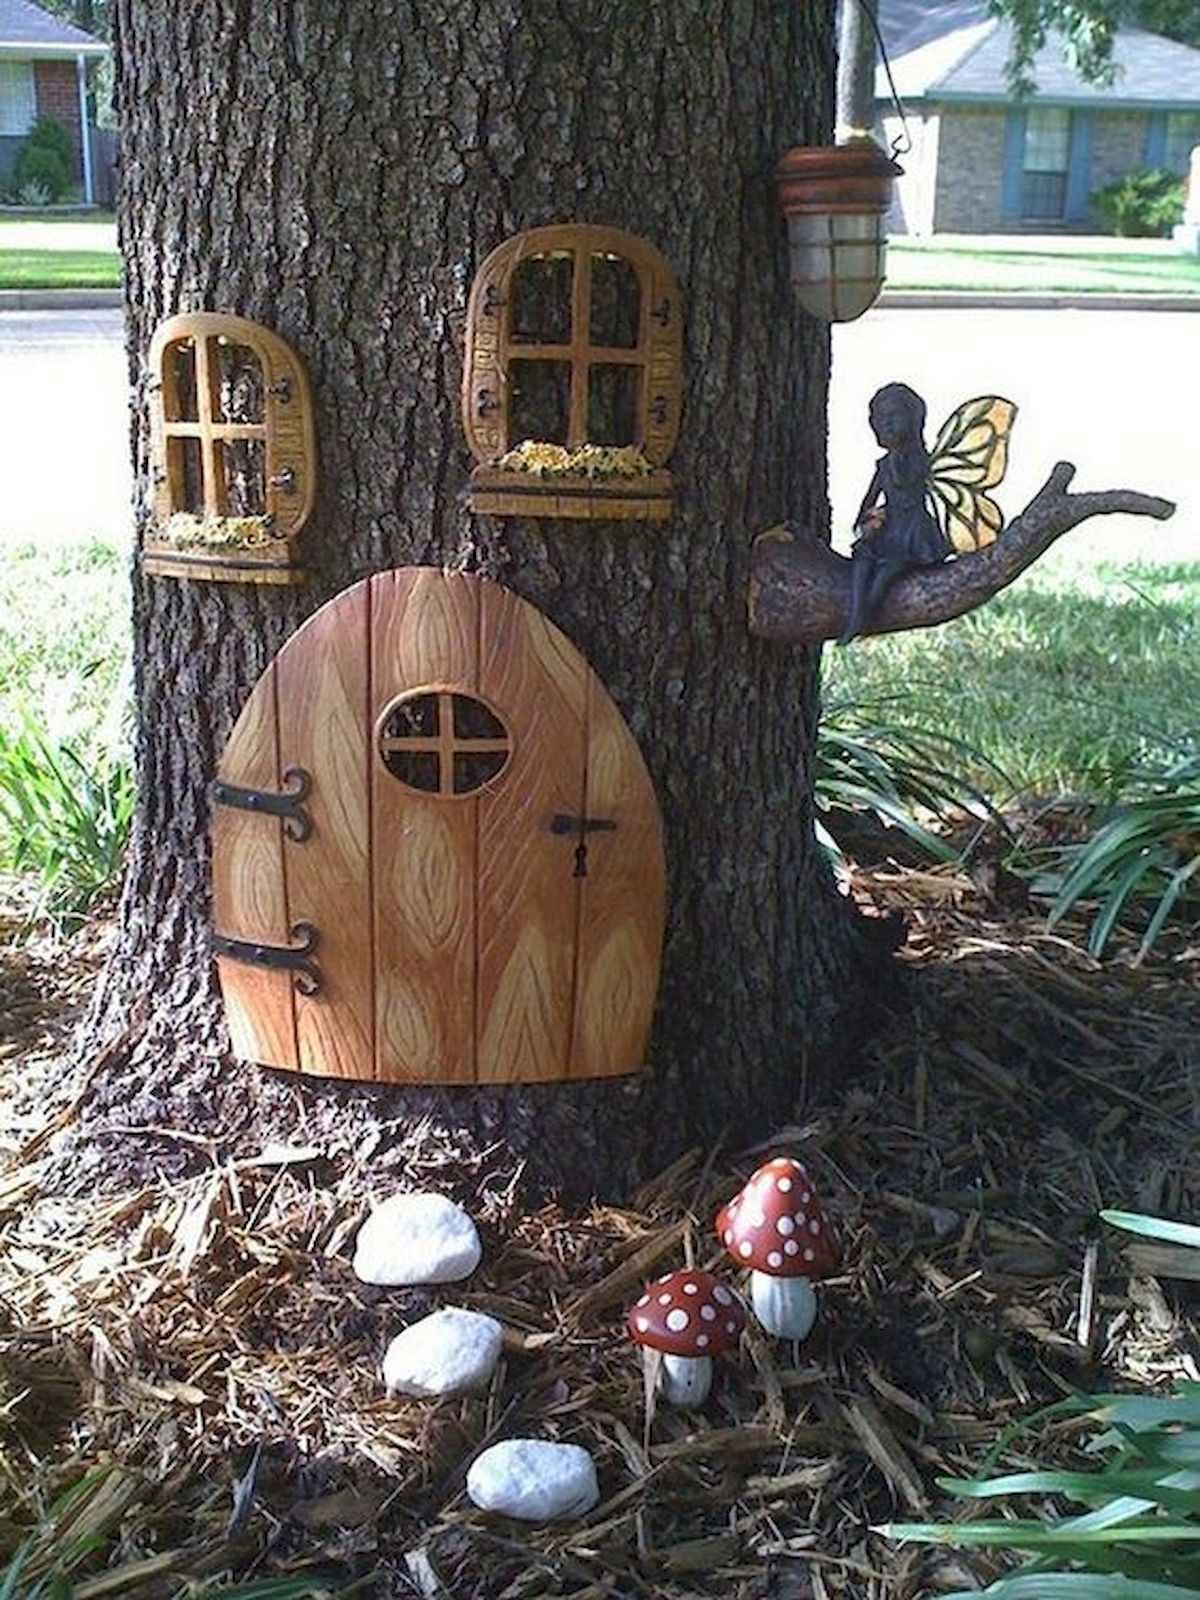 Inspiring Outdoor Metal Design Ideas For Garden Art You Must Try10